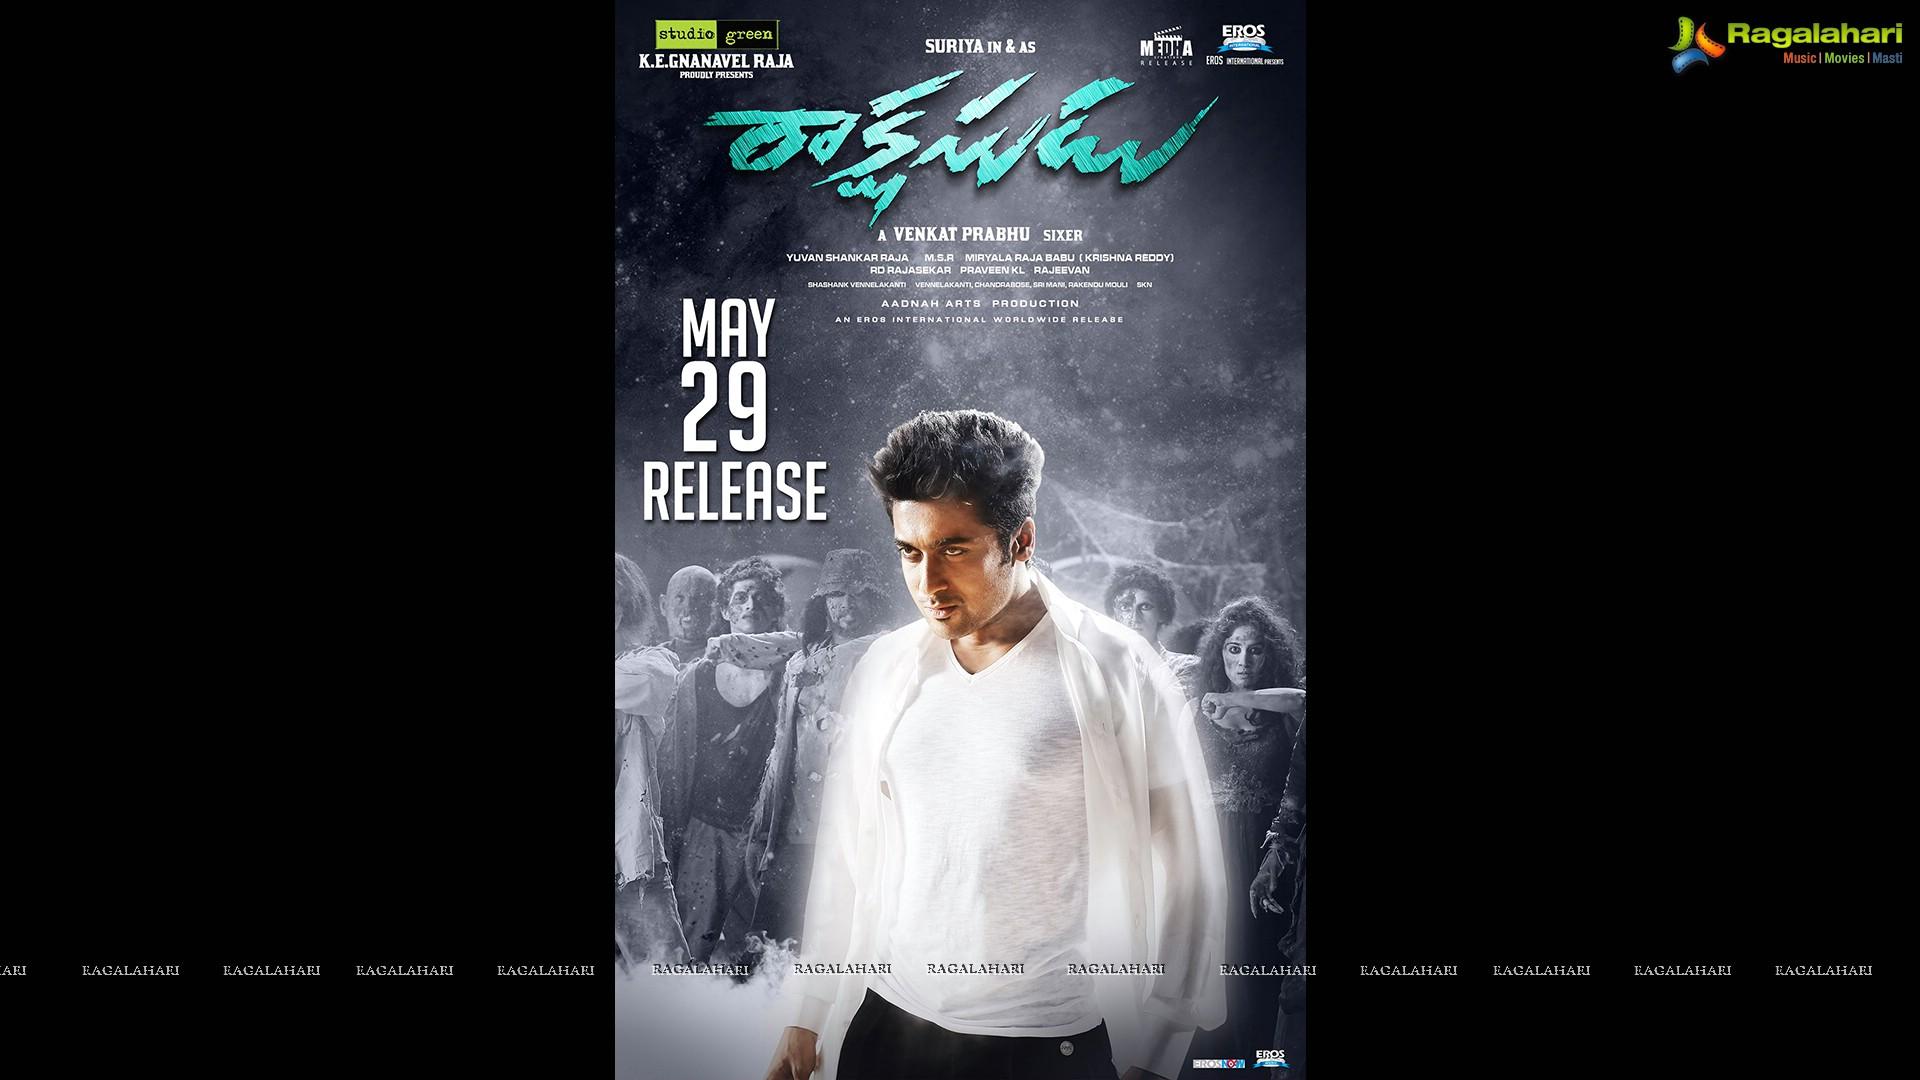 Surya's 'Rakshasudu' grand release on May 29